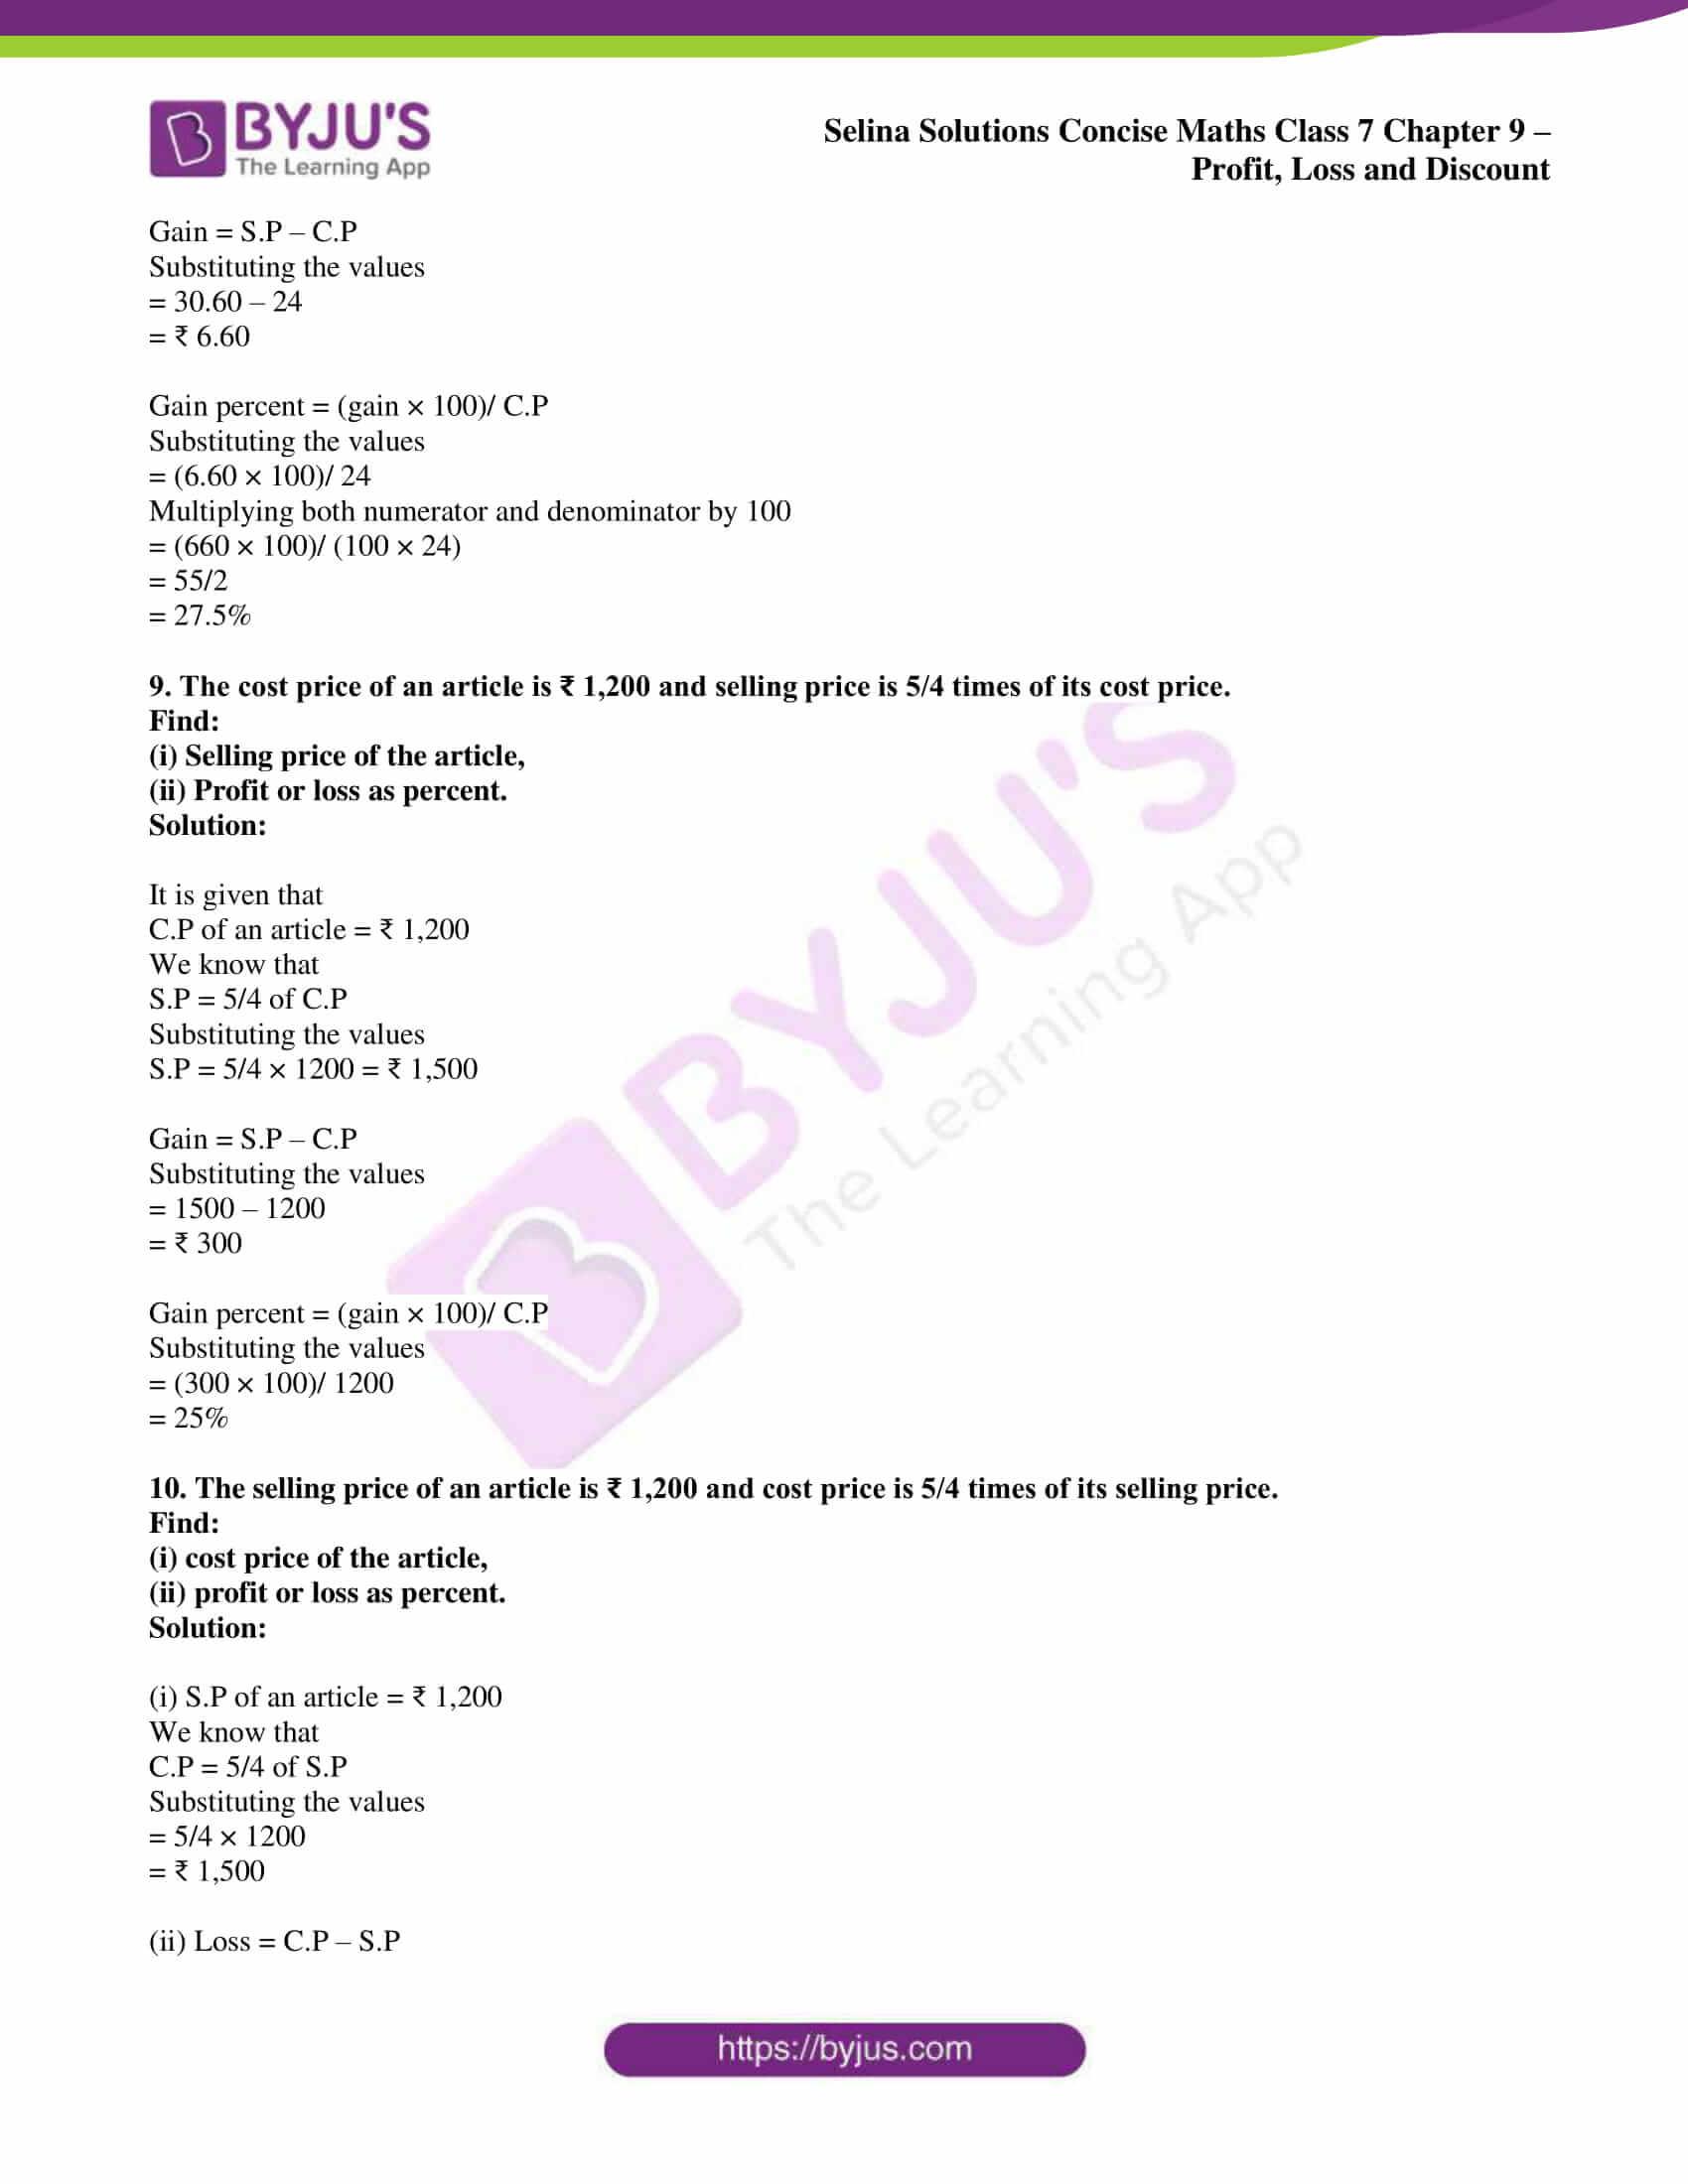 selina sol concise maths class 7 ch9 ex 9a 5